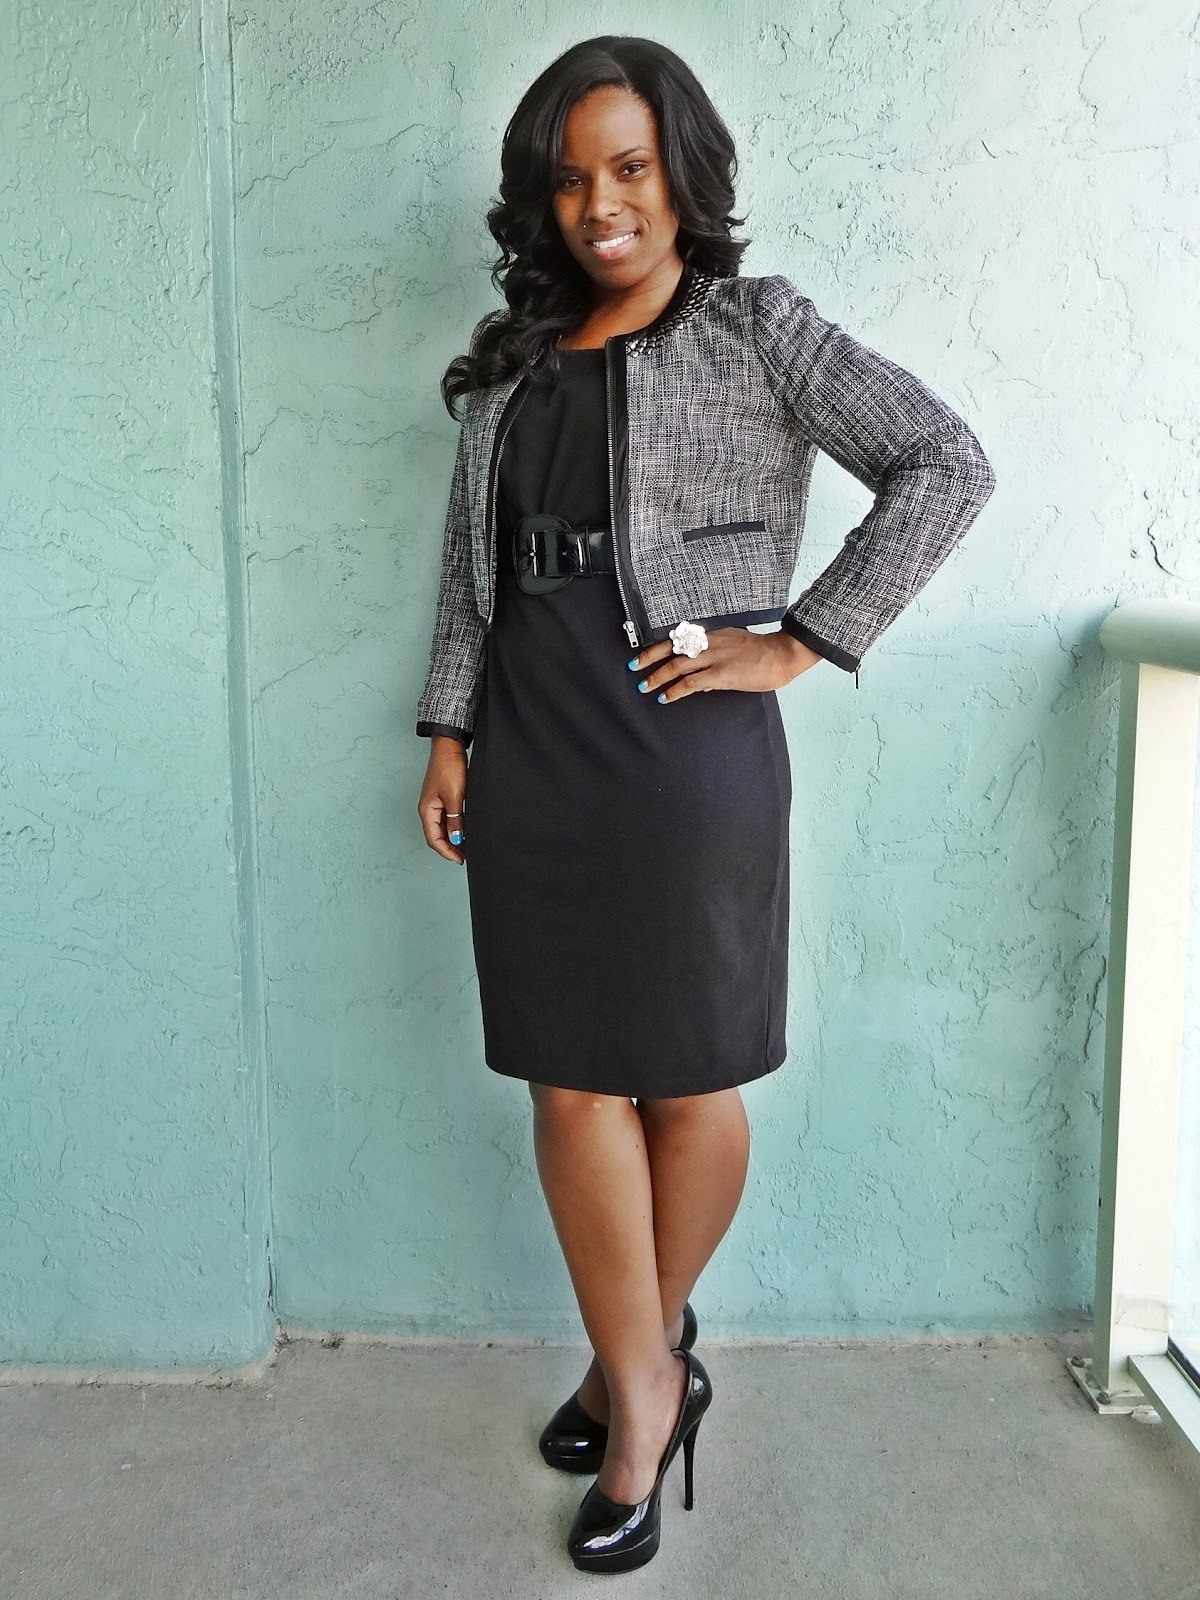 Professional Black Dresses